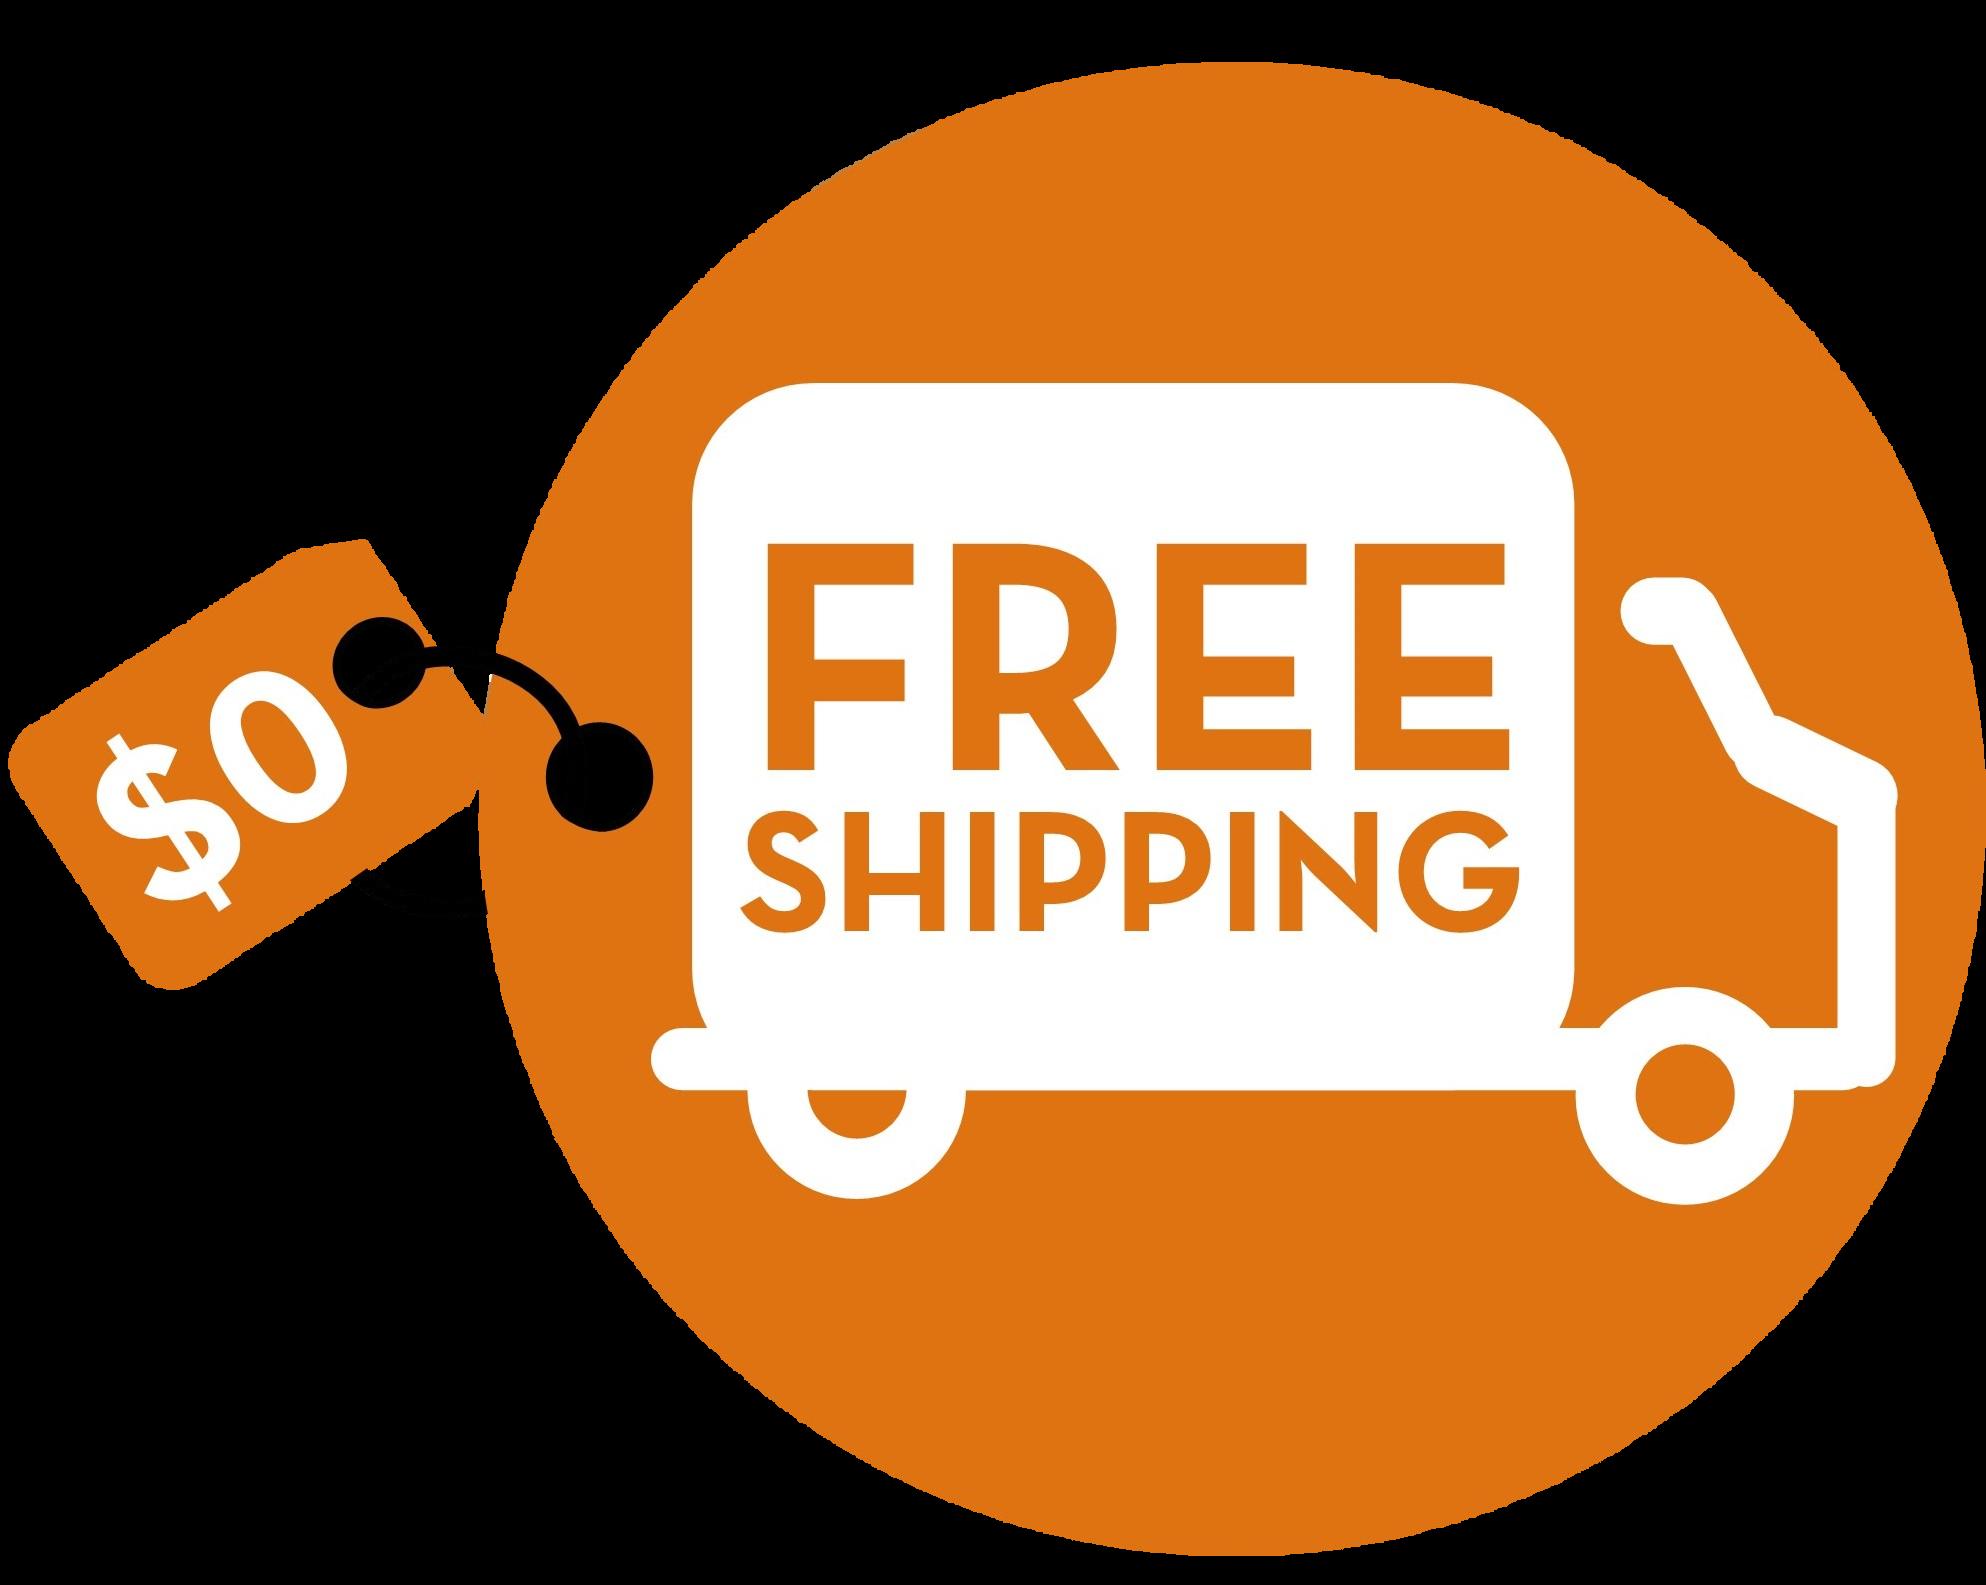 free-shipping-icon.jpg